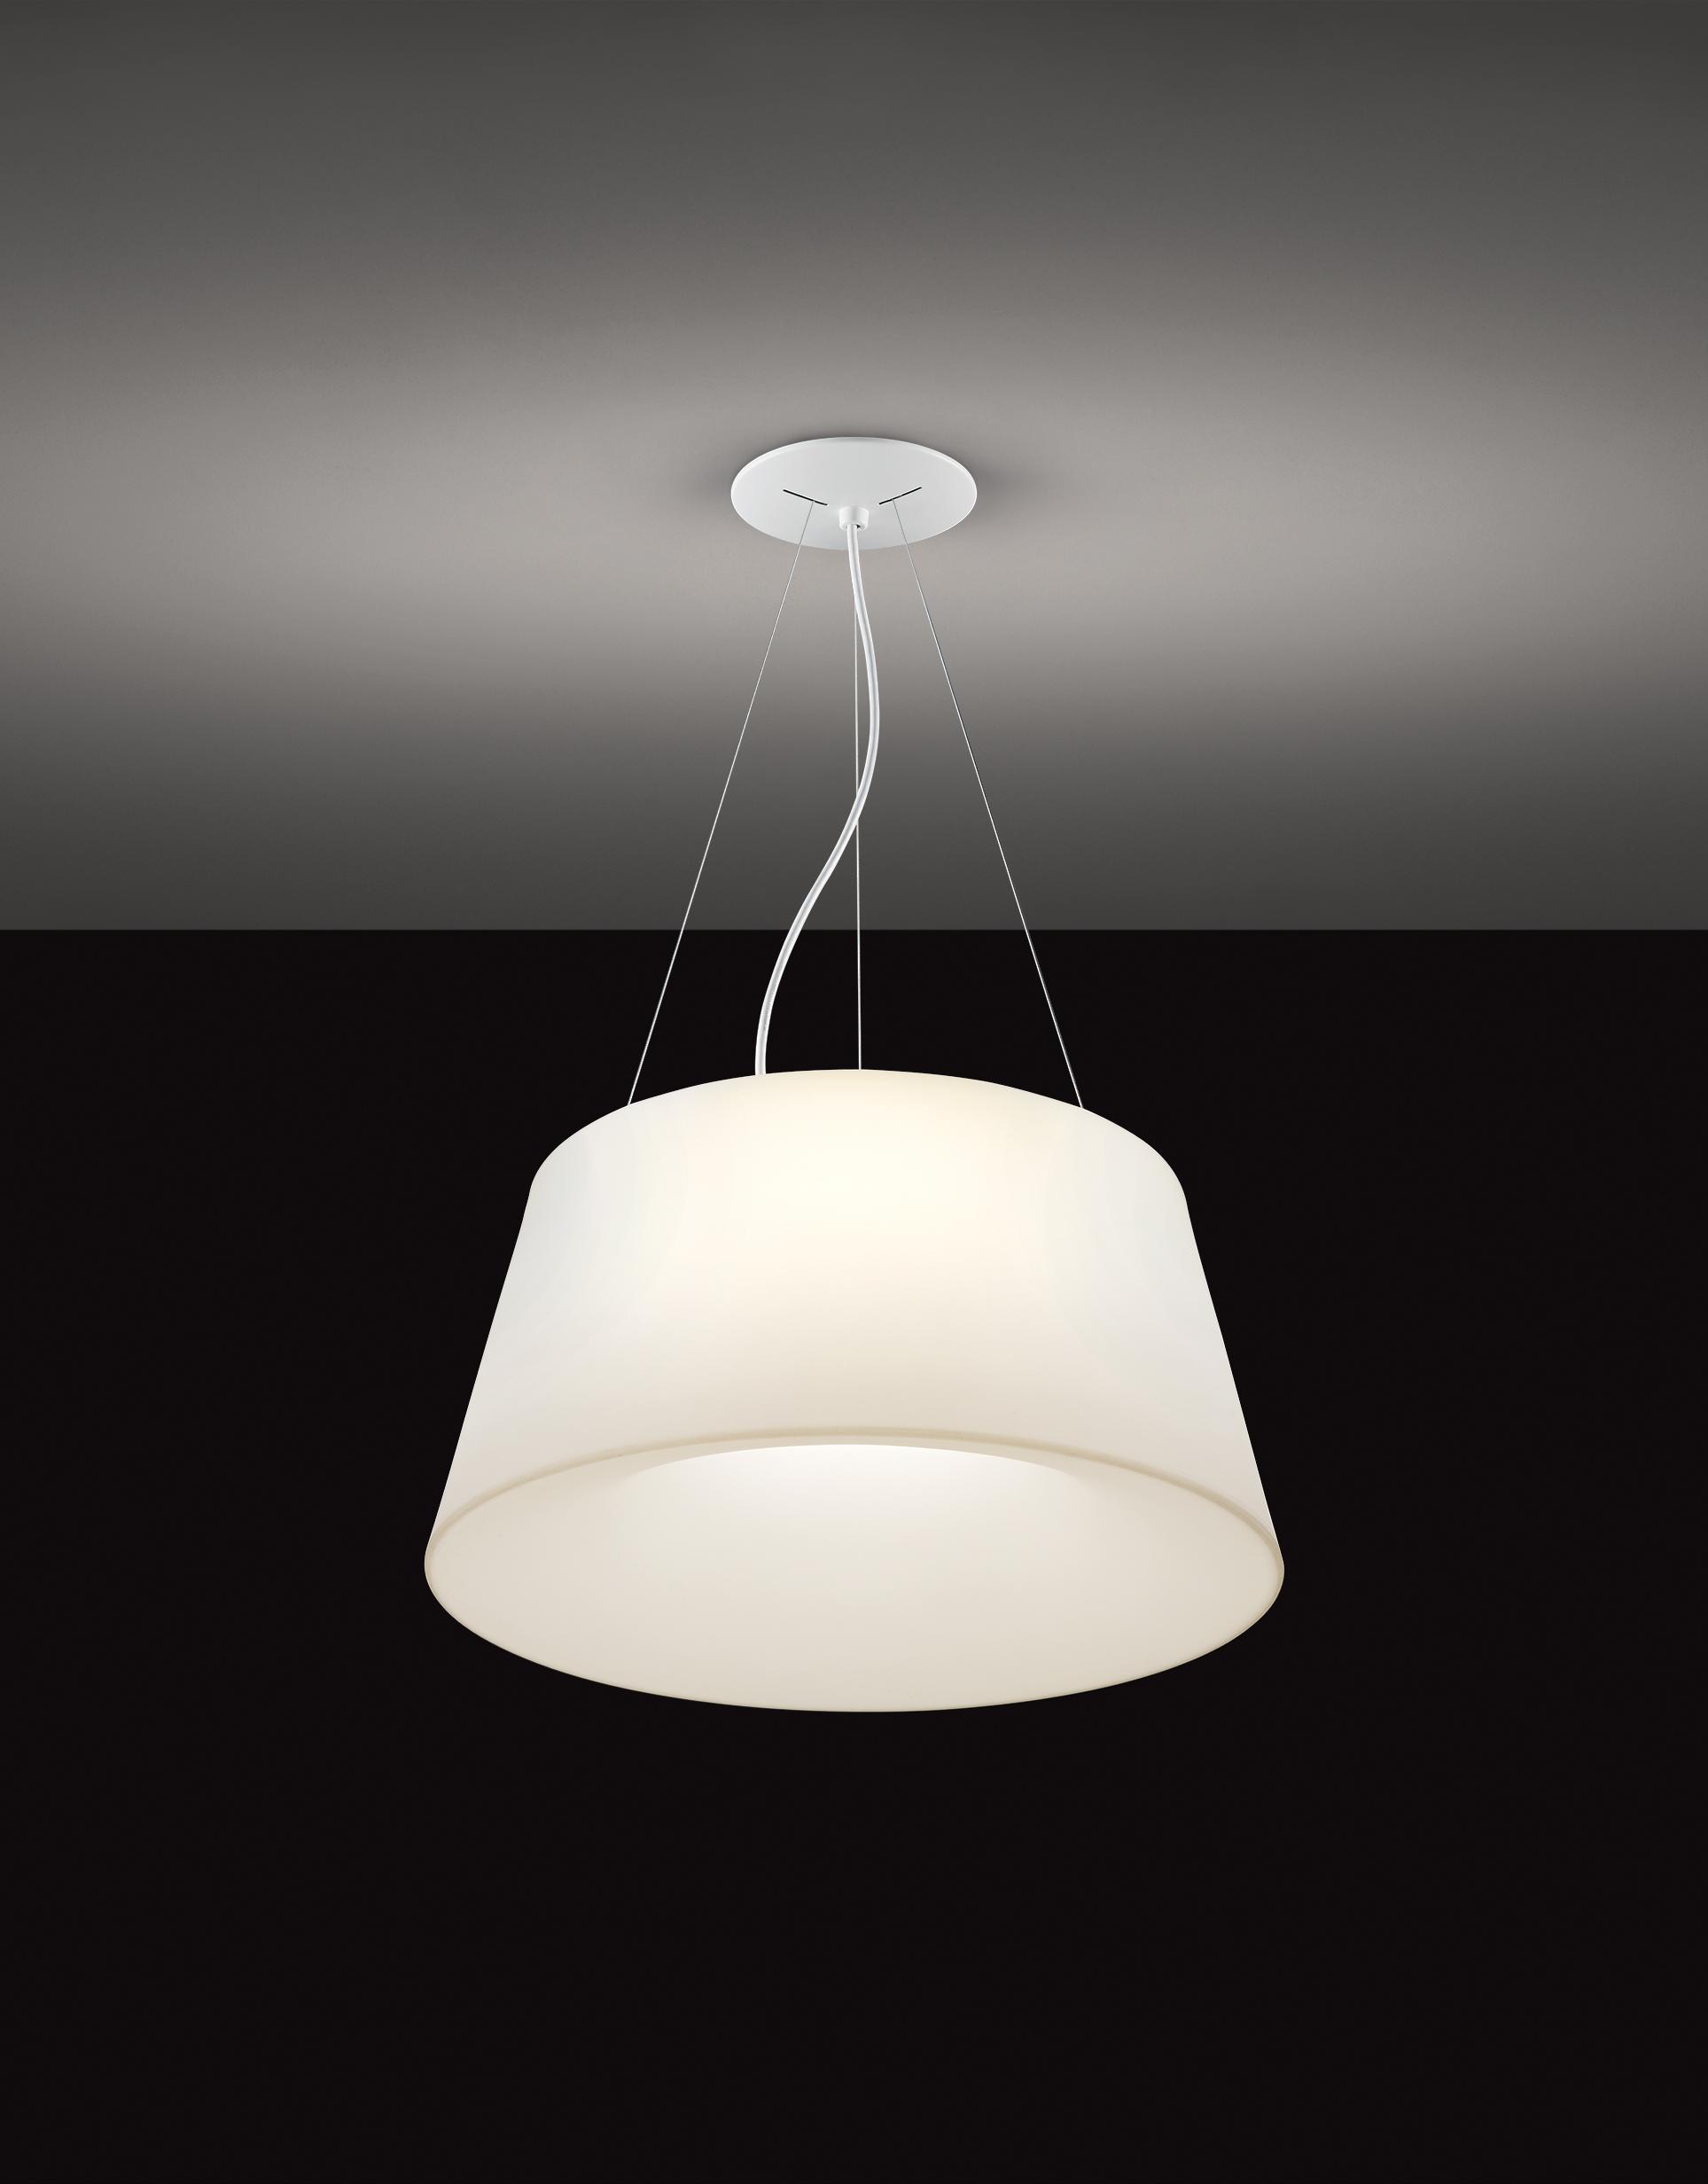 Loop Pendant Ocl Architectural Lighting